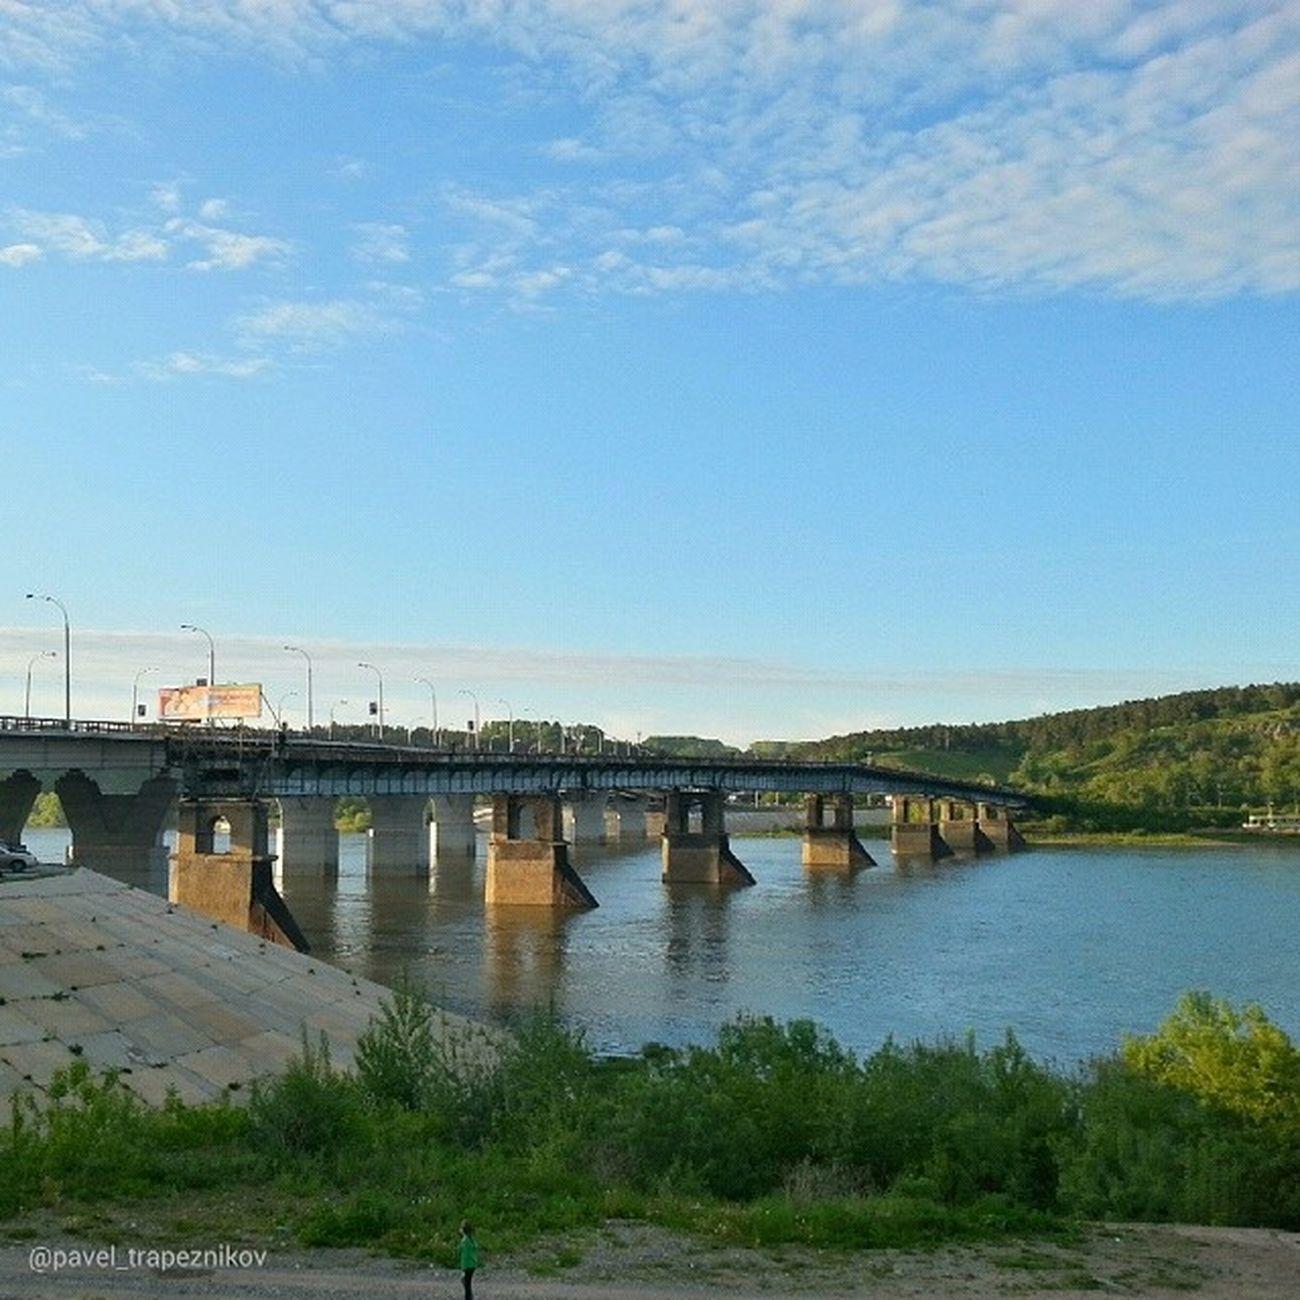 20140612 , Кемерово . кузнецкиймост / Kemerovo . Kuznetskу bridge.